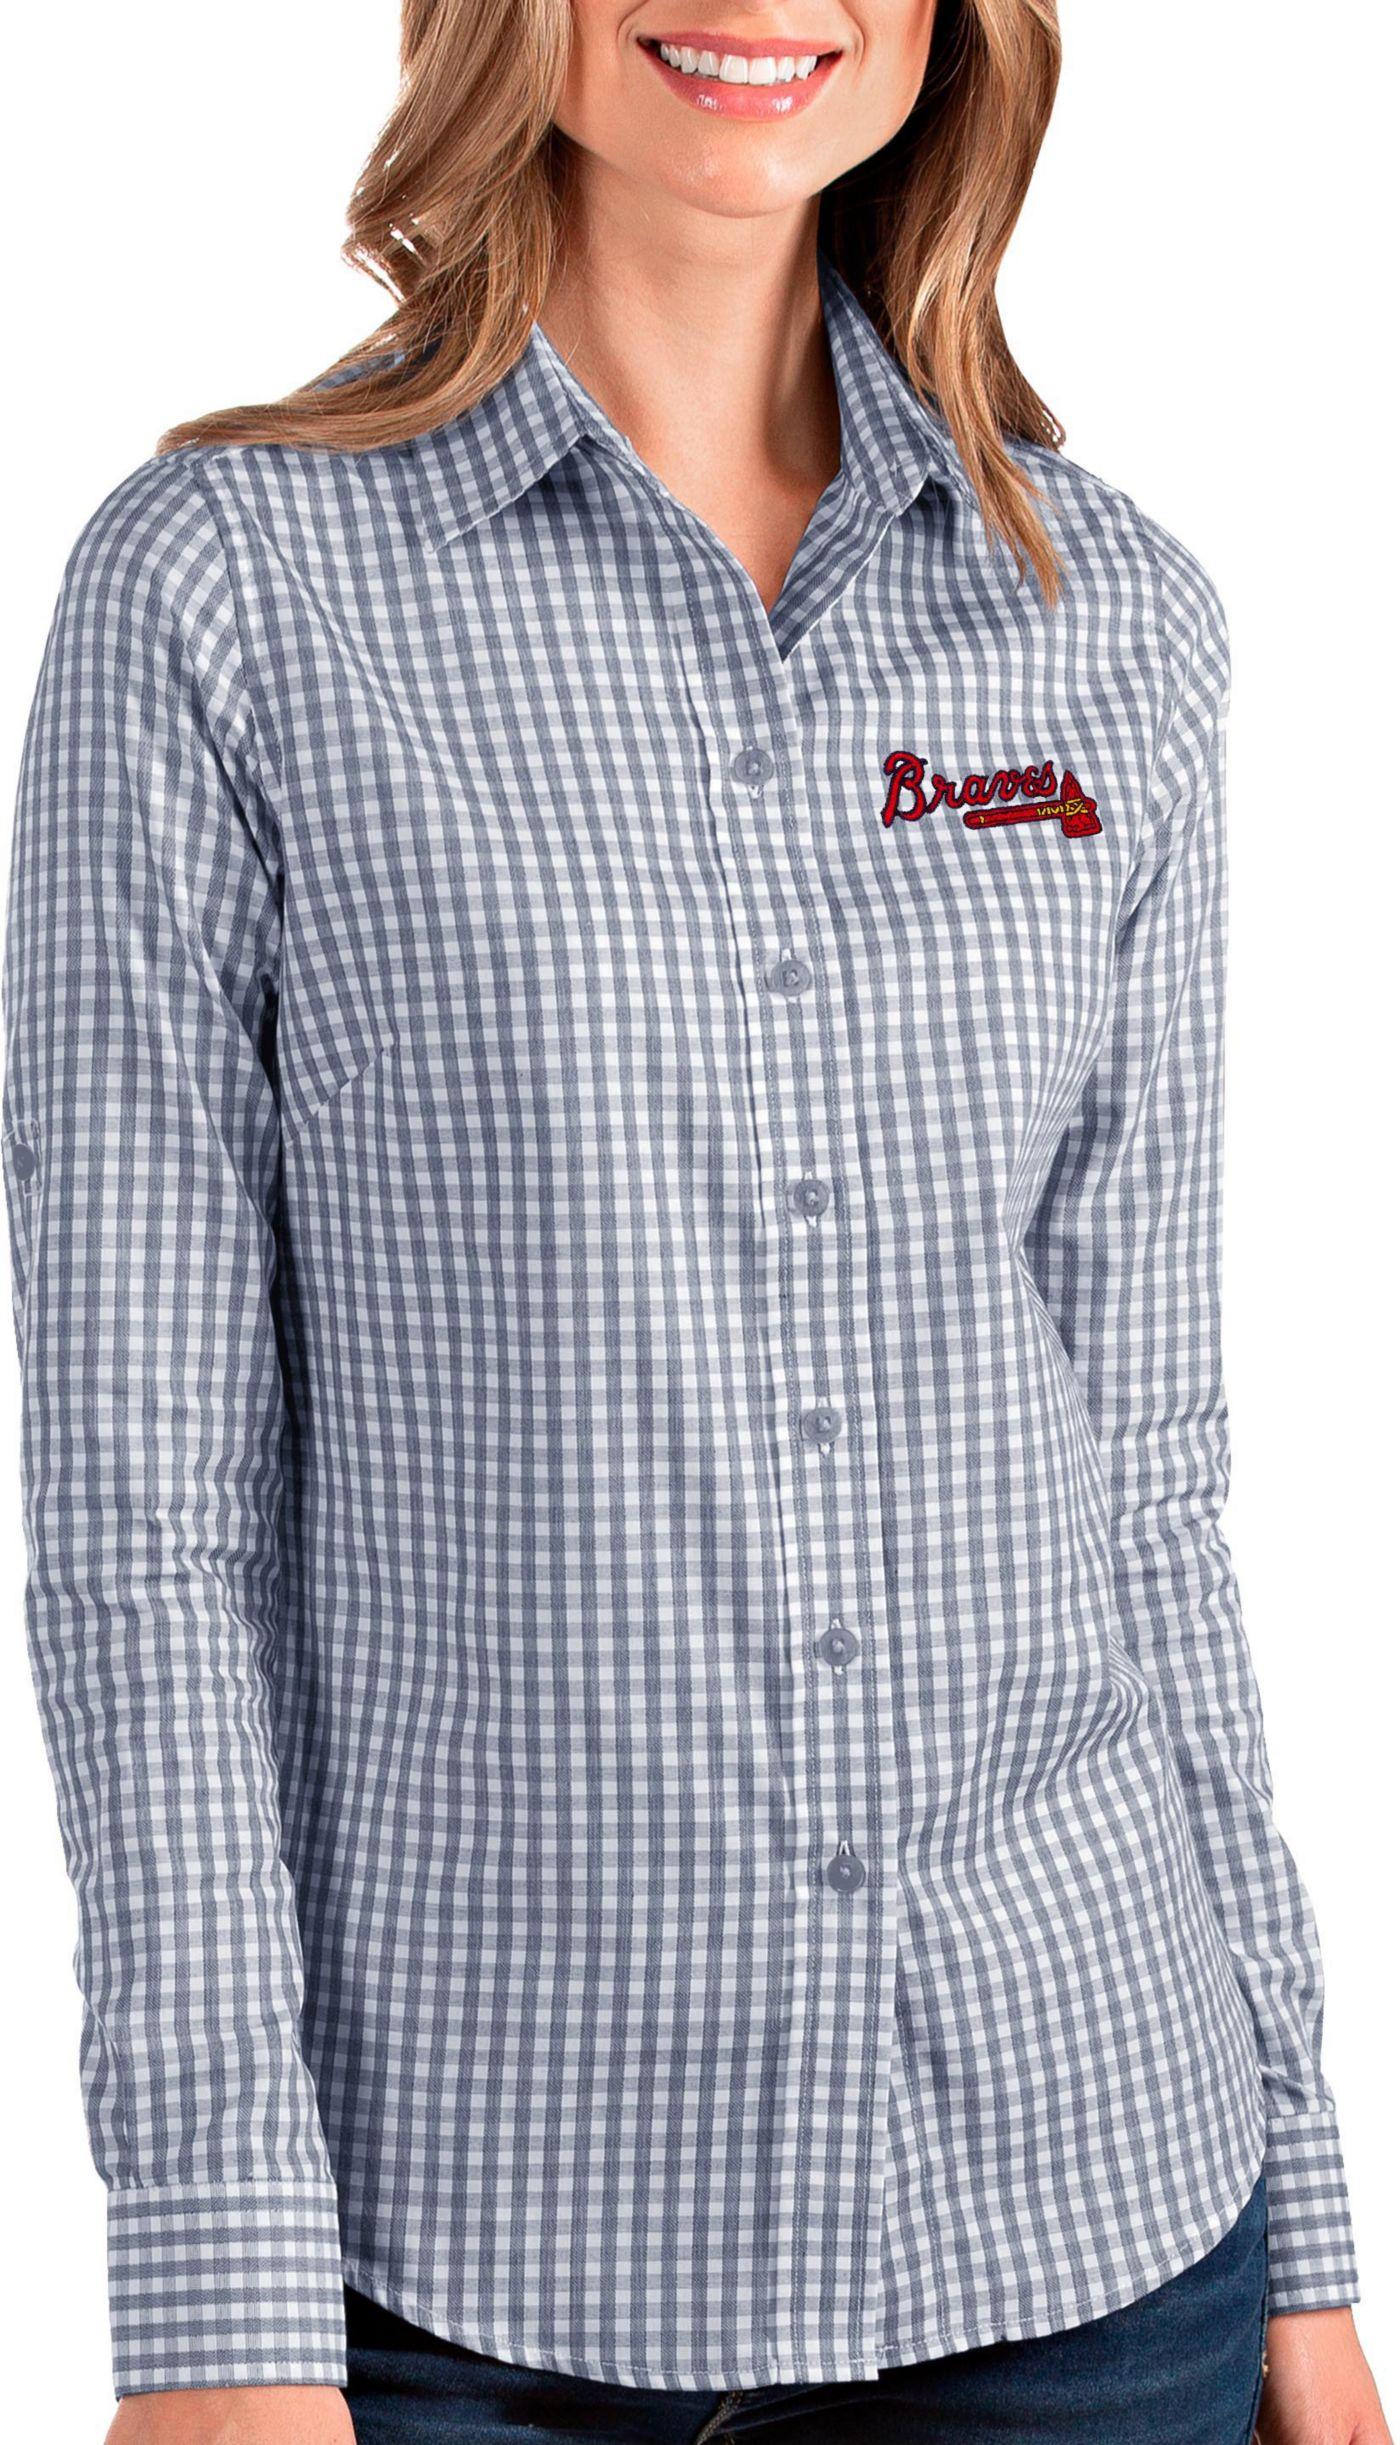 Antigua Women's Atlanta Braves Structure Button-Up Navy Long Sleeve Shirt